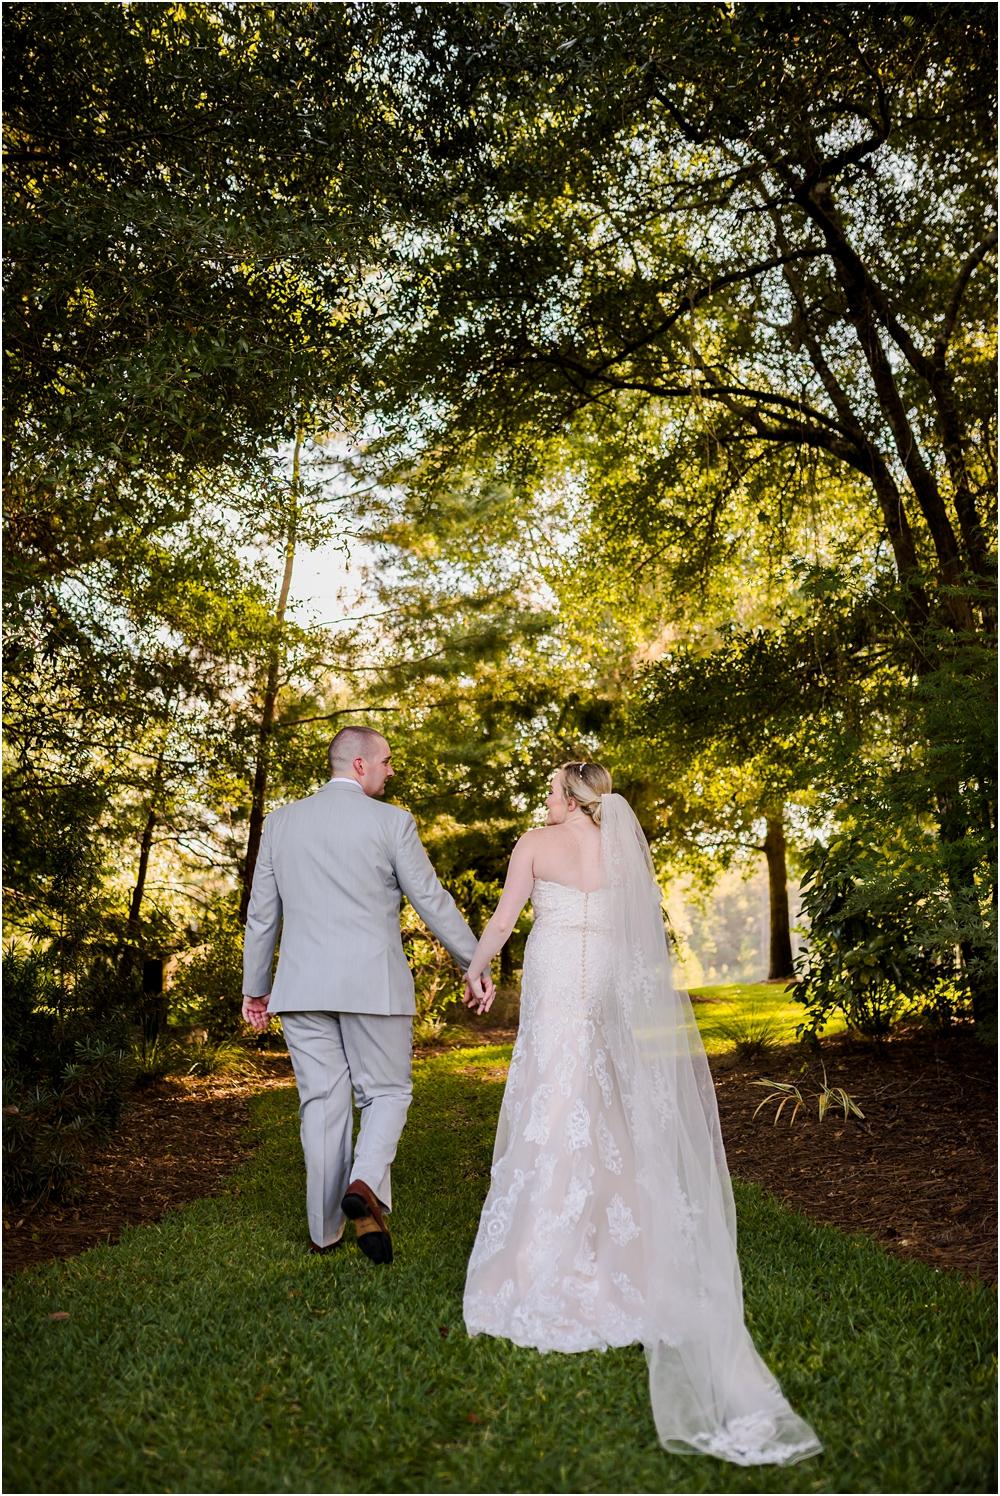 matthew-wedding-kiersten-stevenson-photography-30a-panama-city-beach-dothan-tallahassee-(149-of-579).JPG